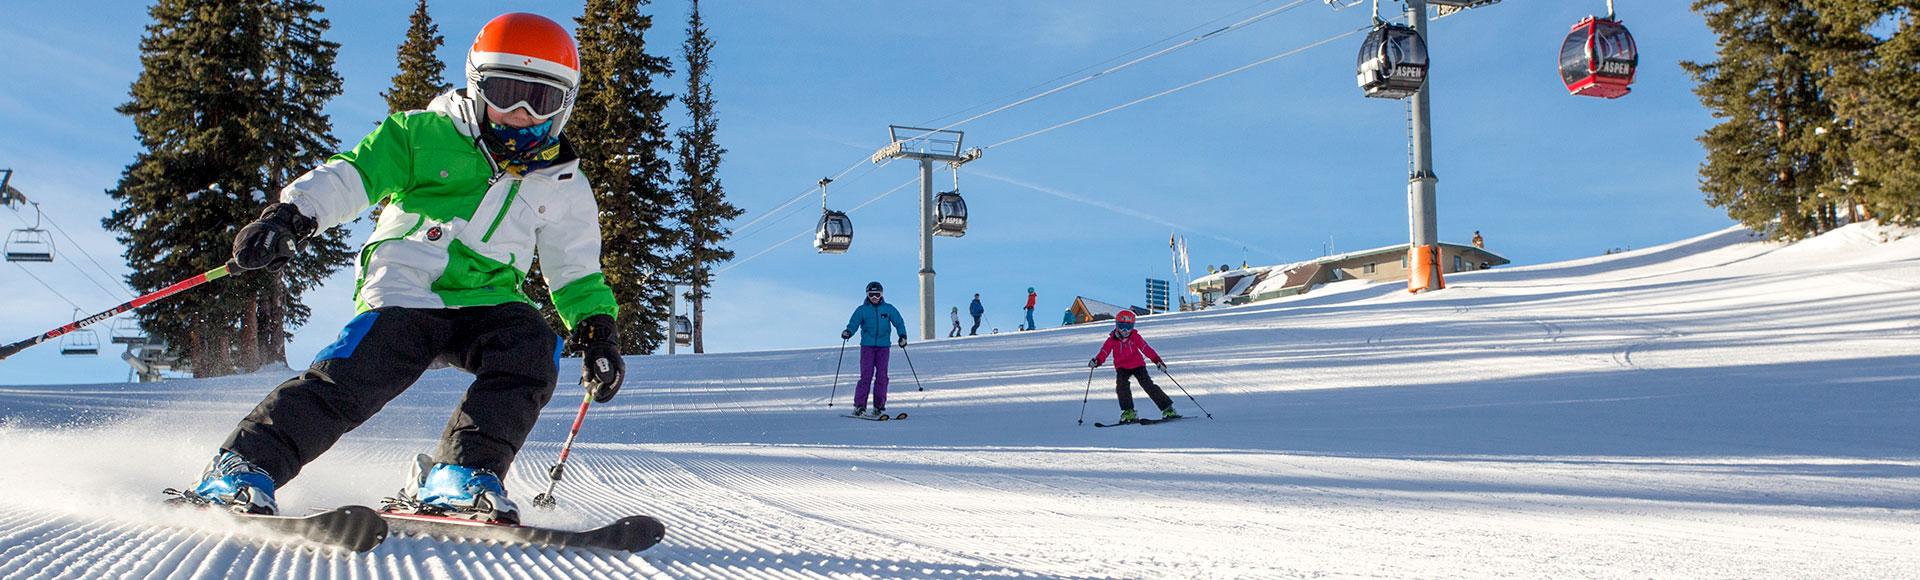 kid-ski-free-home